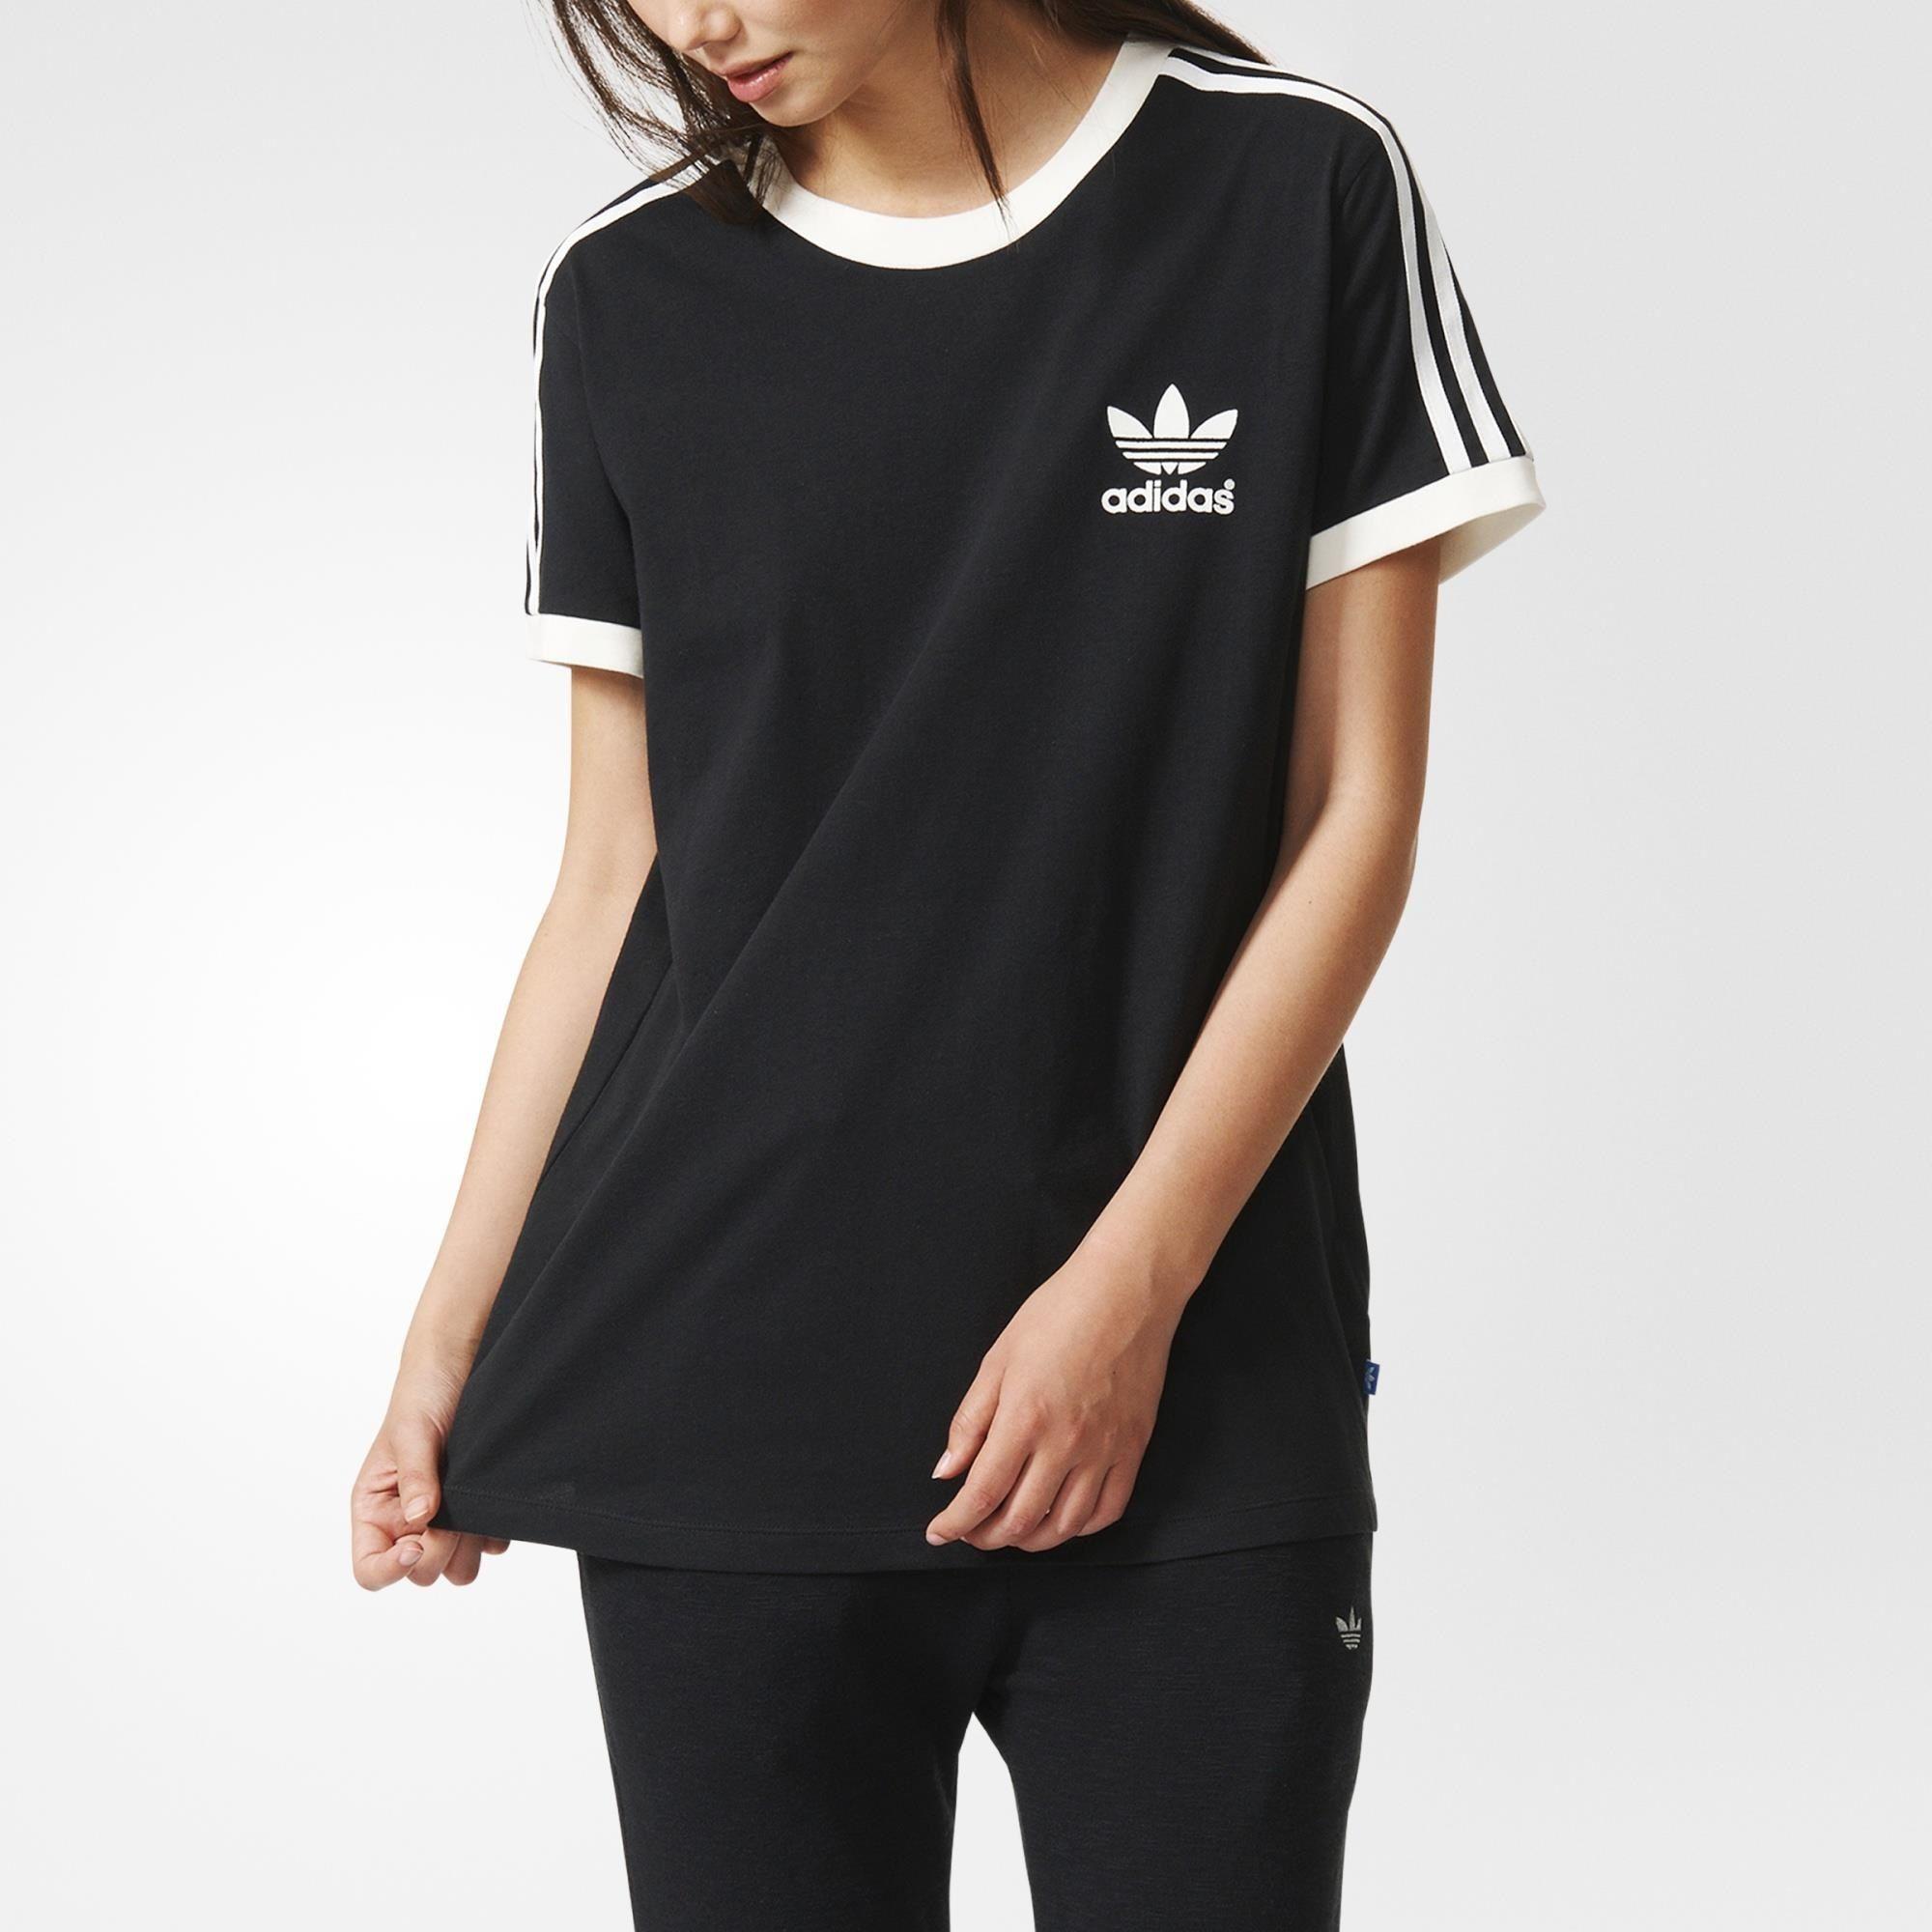 21f89815e0e Adidas Originals T Shirts Womens – EDGE Engineering and Consulting ...